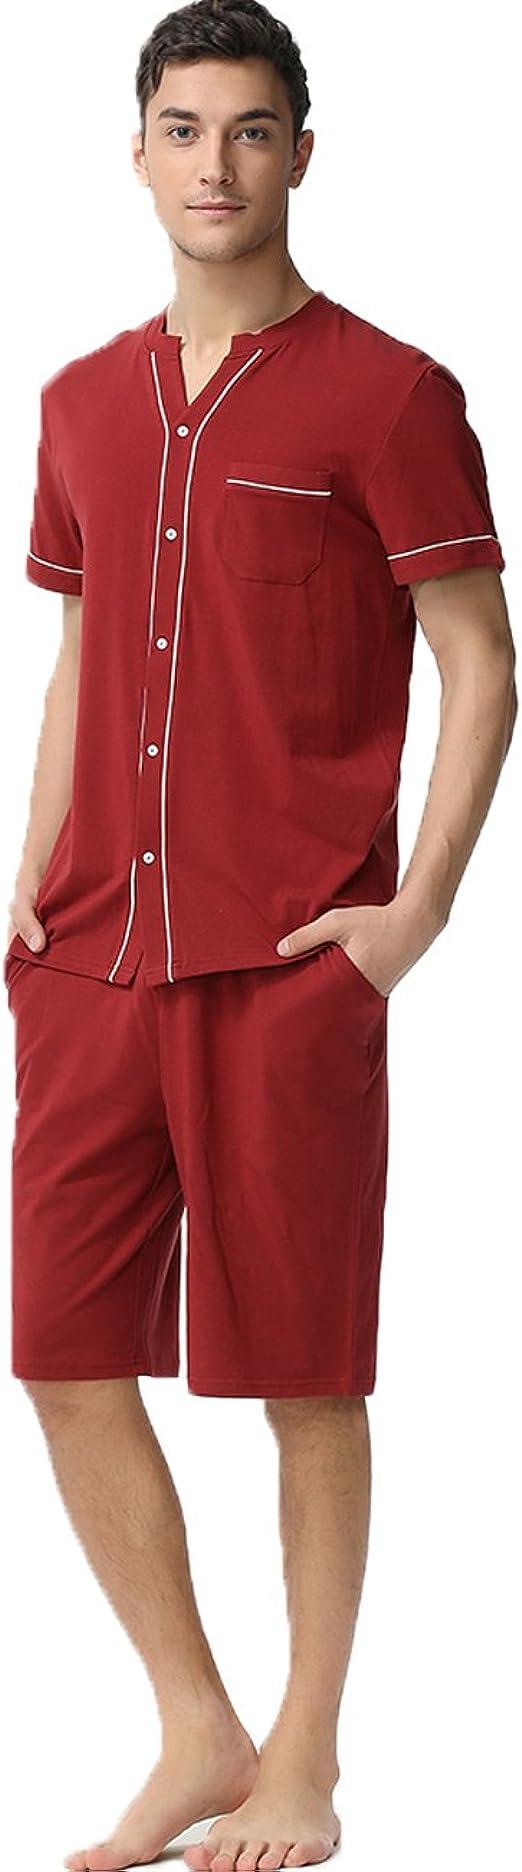 qianxiu Mujer Zara pijamas pantalones de pijama pantalones de los amantes de la pareja PJ